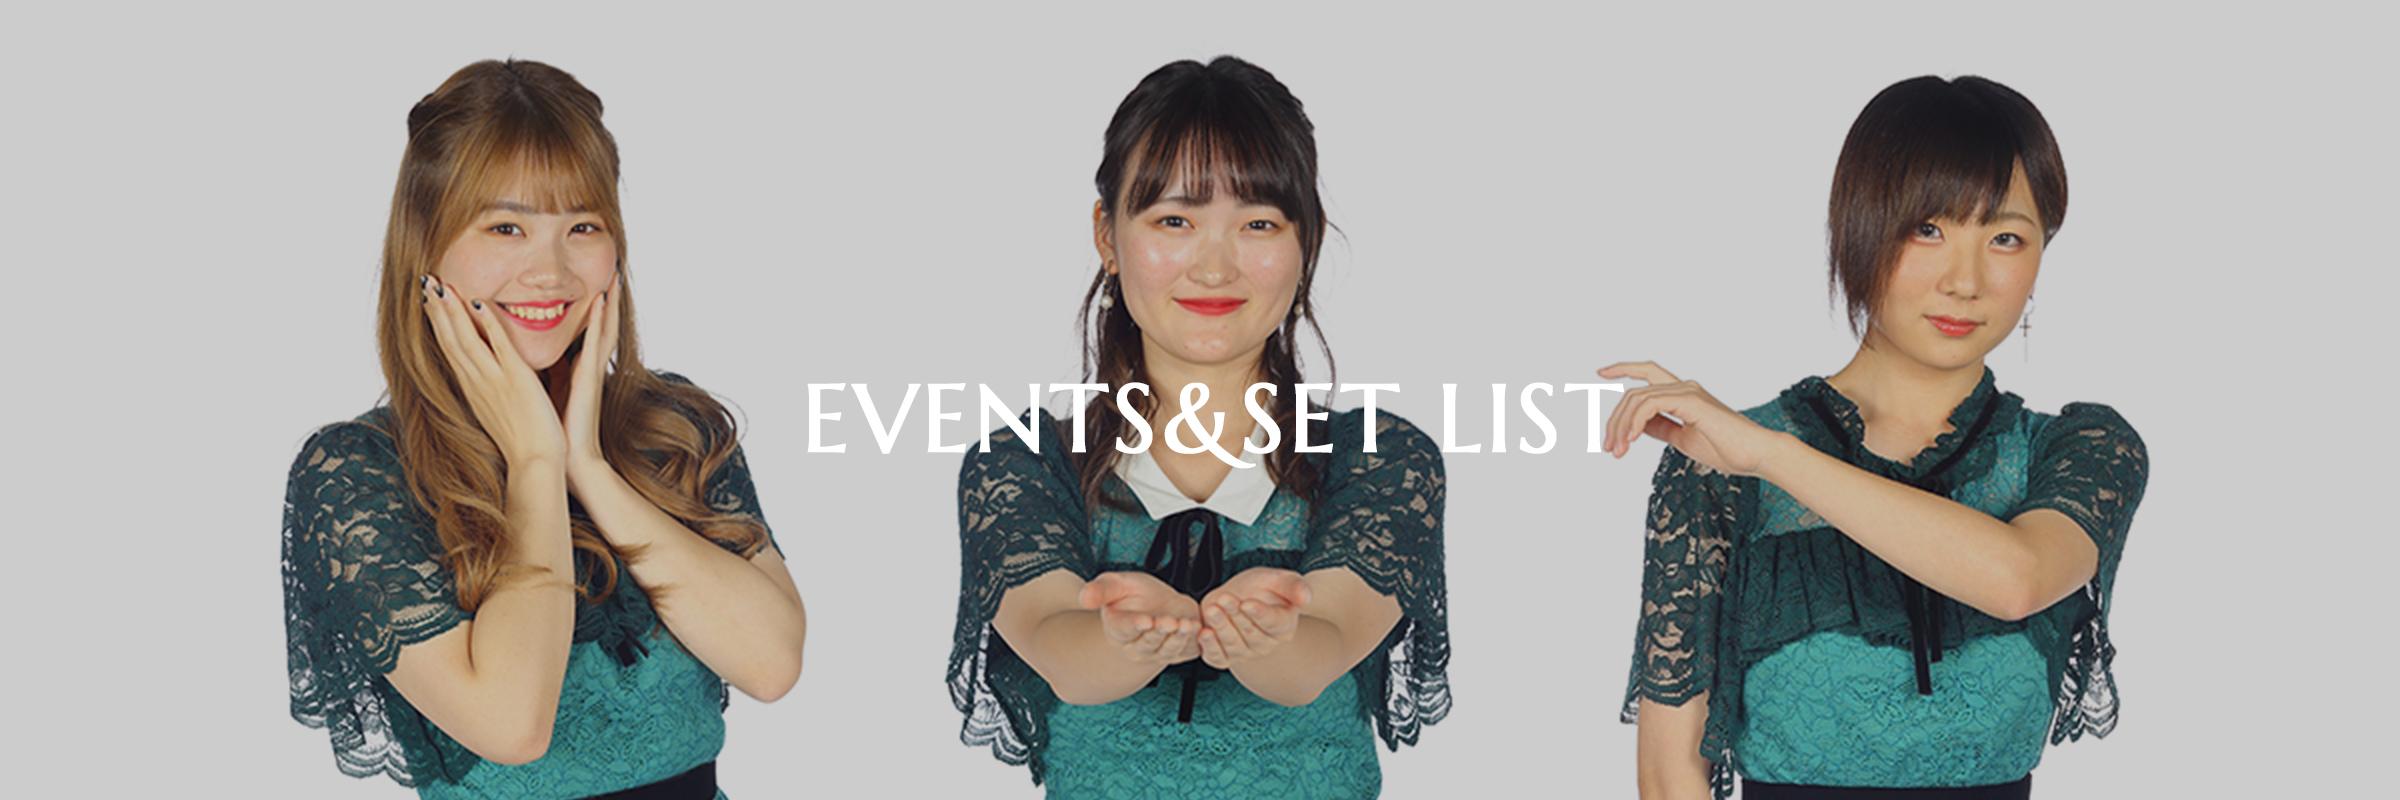 EVENT&SETLIST